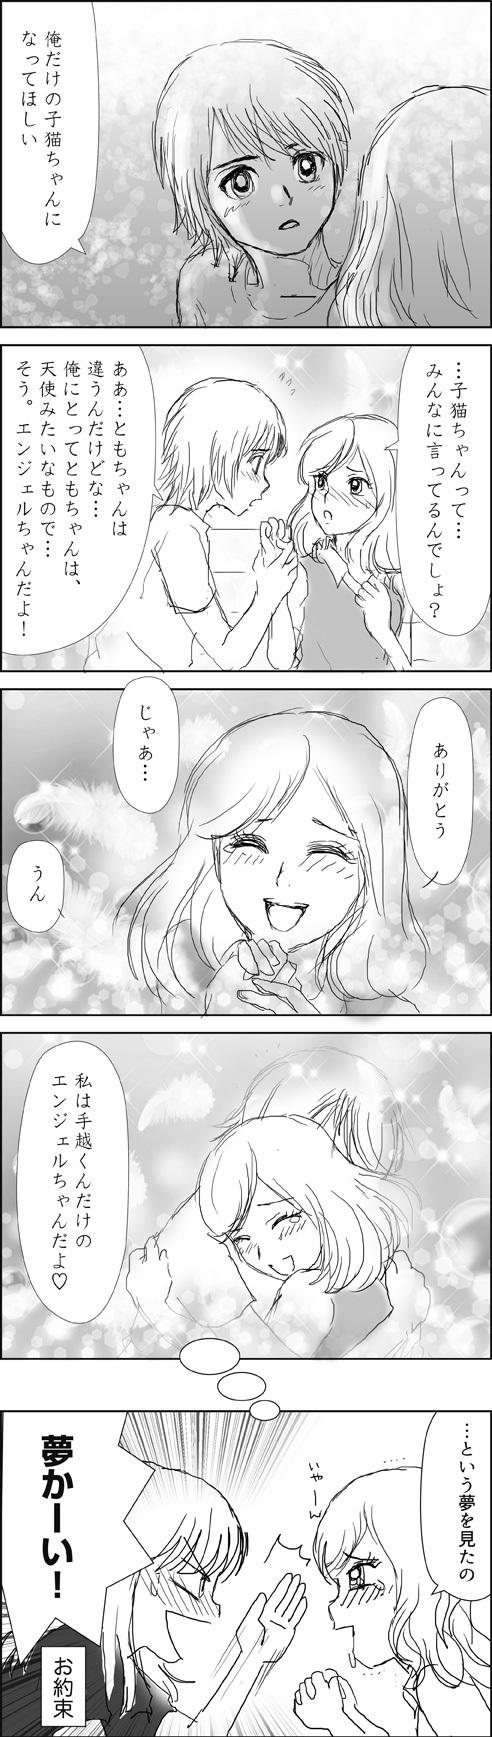 0510_20tadasuke.jpg